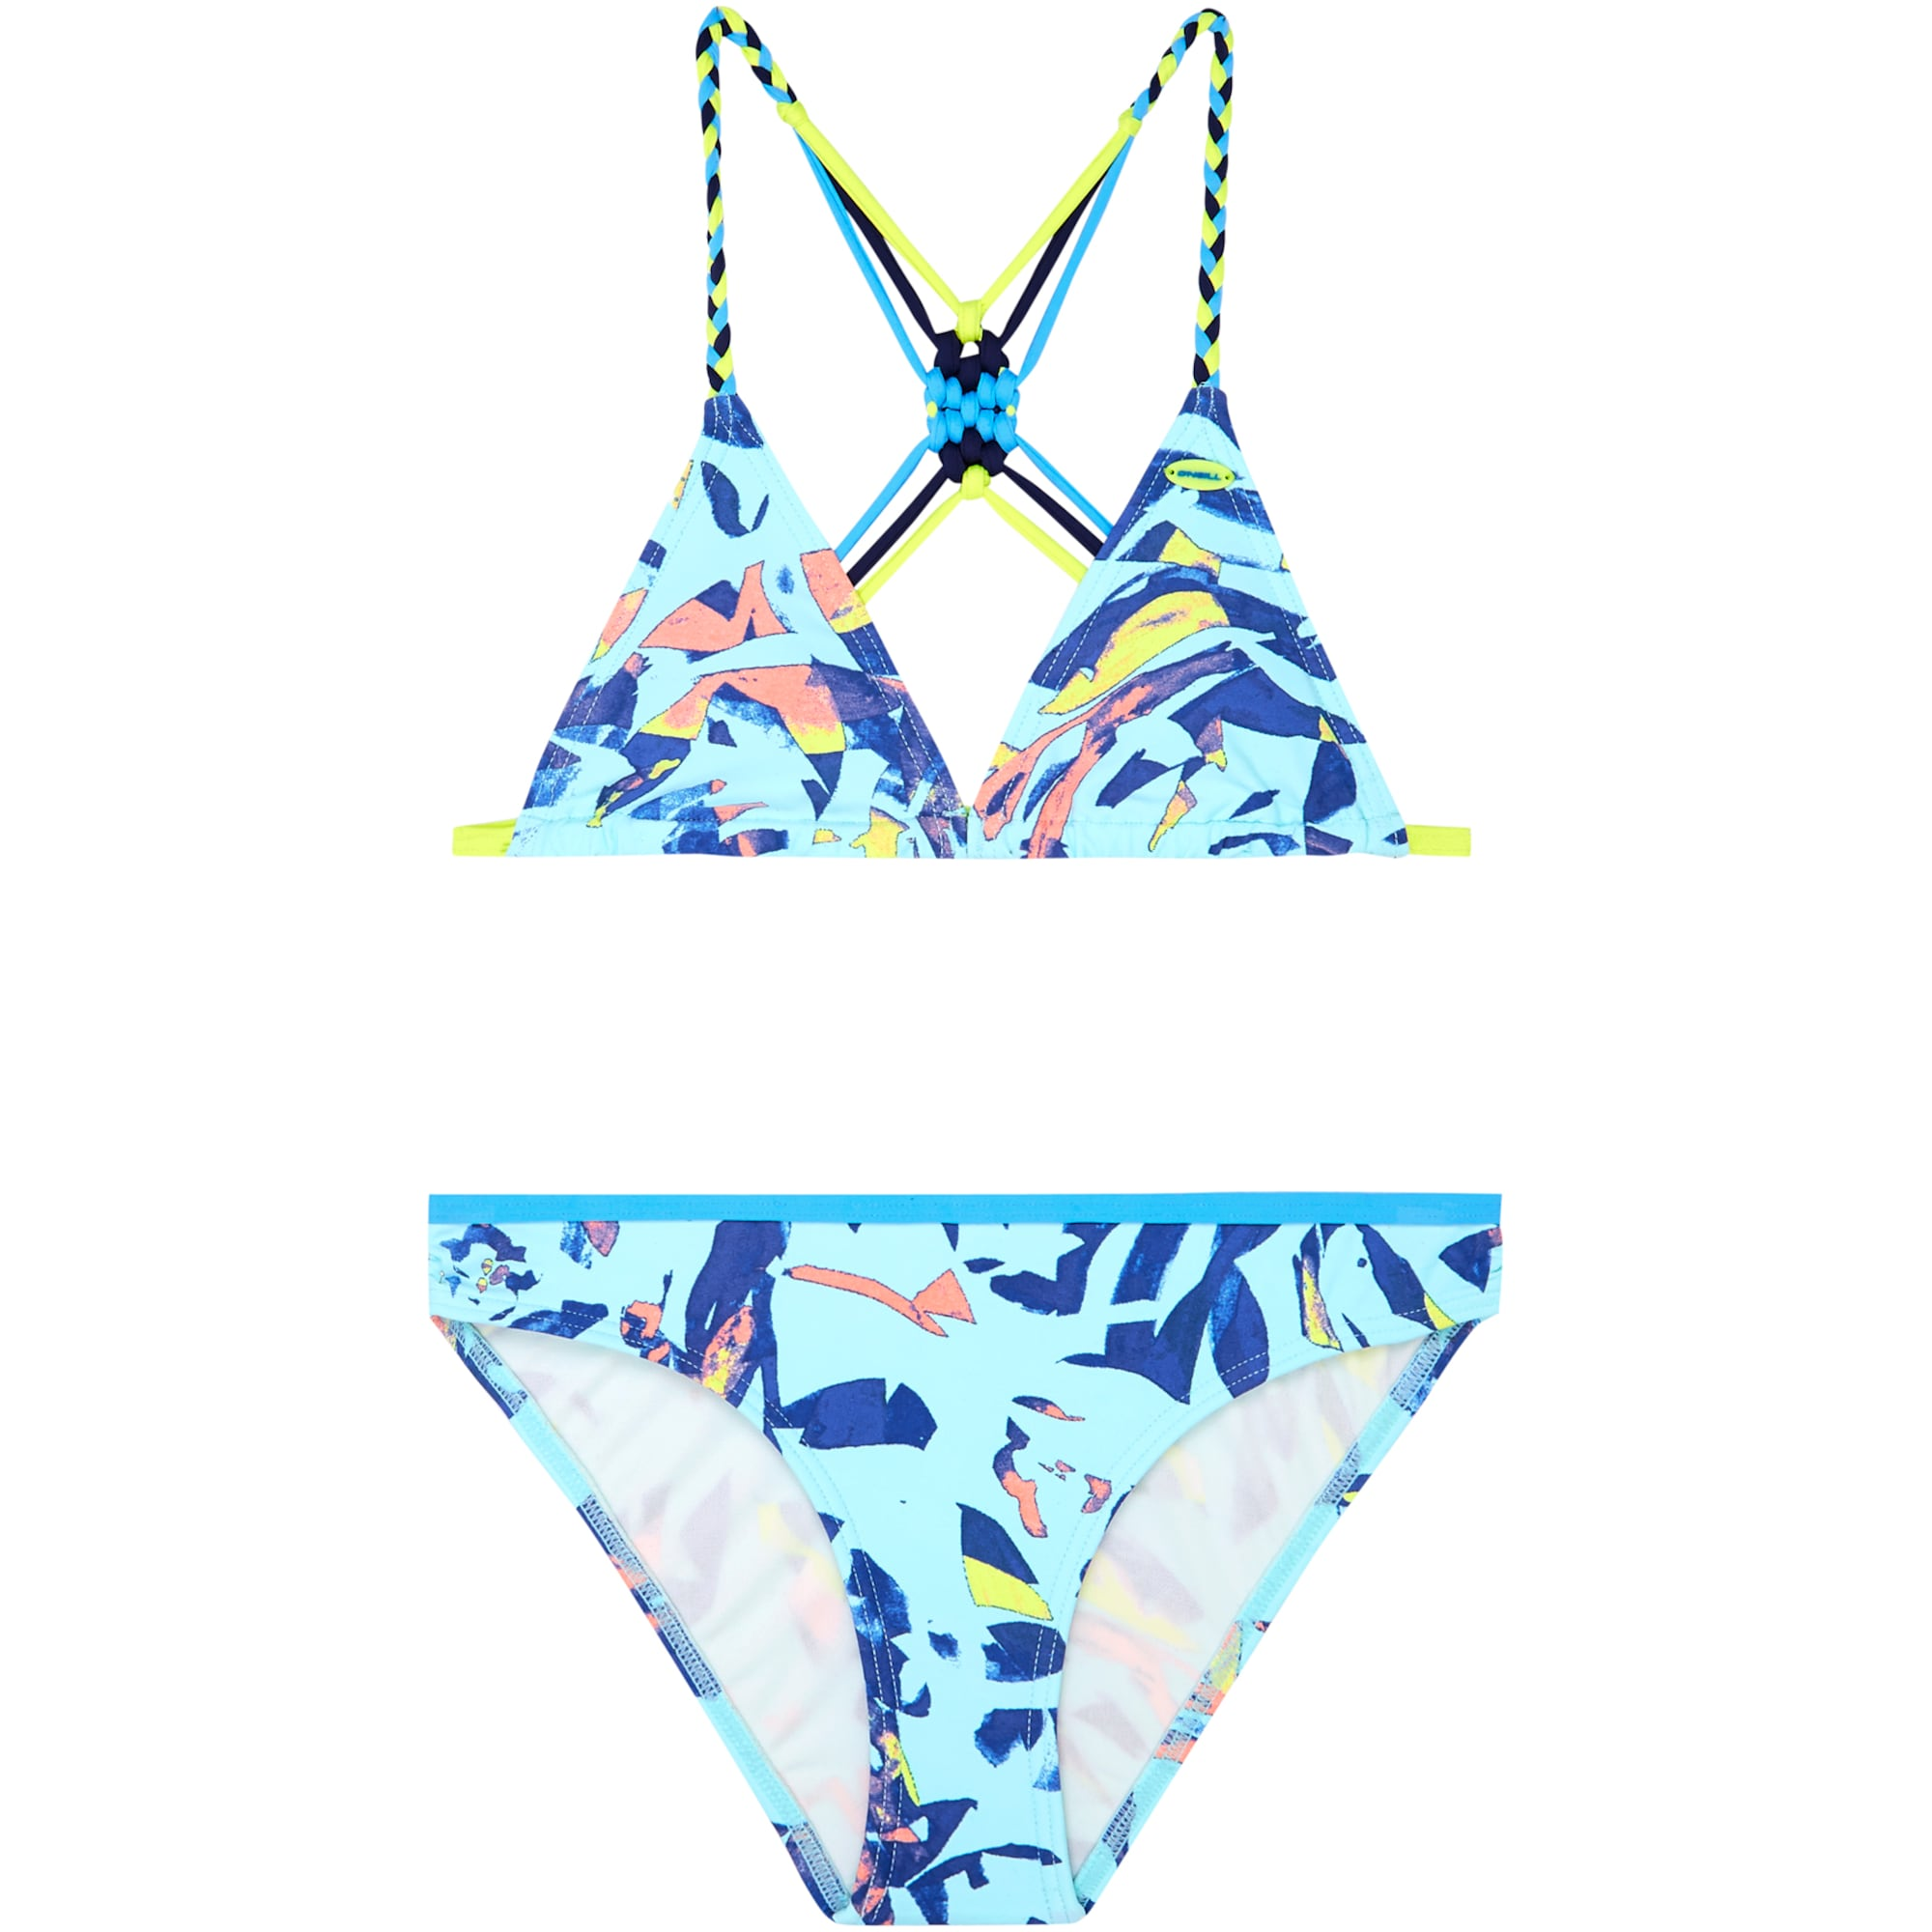 O'NEILL Bikinis 'PG MACRAME' šviesiai mėlyna